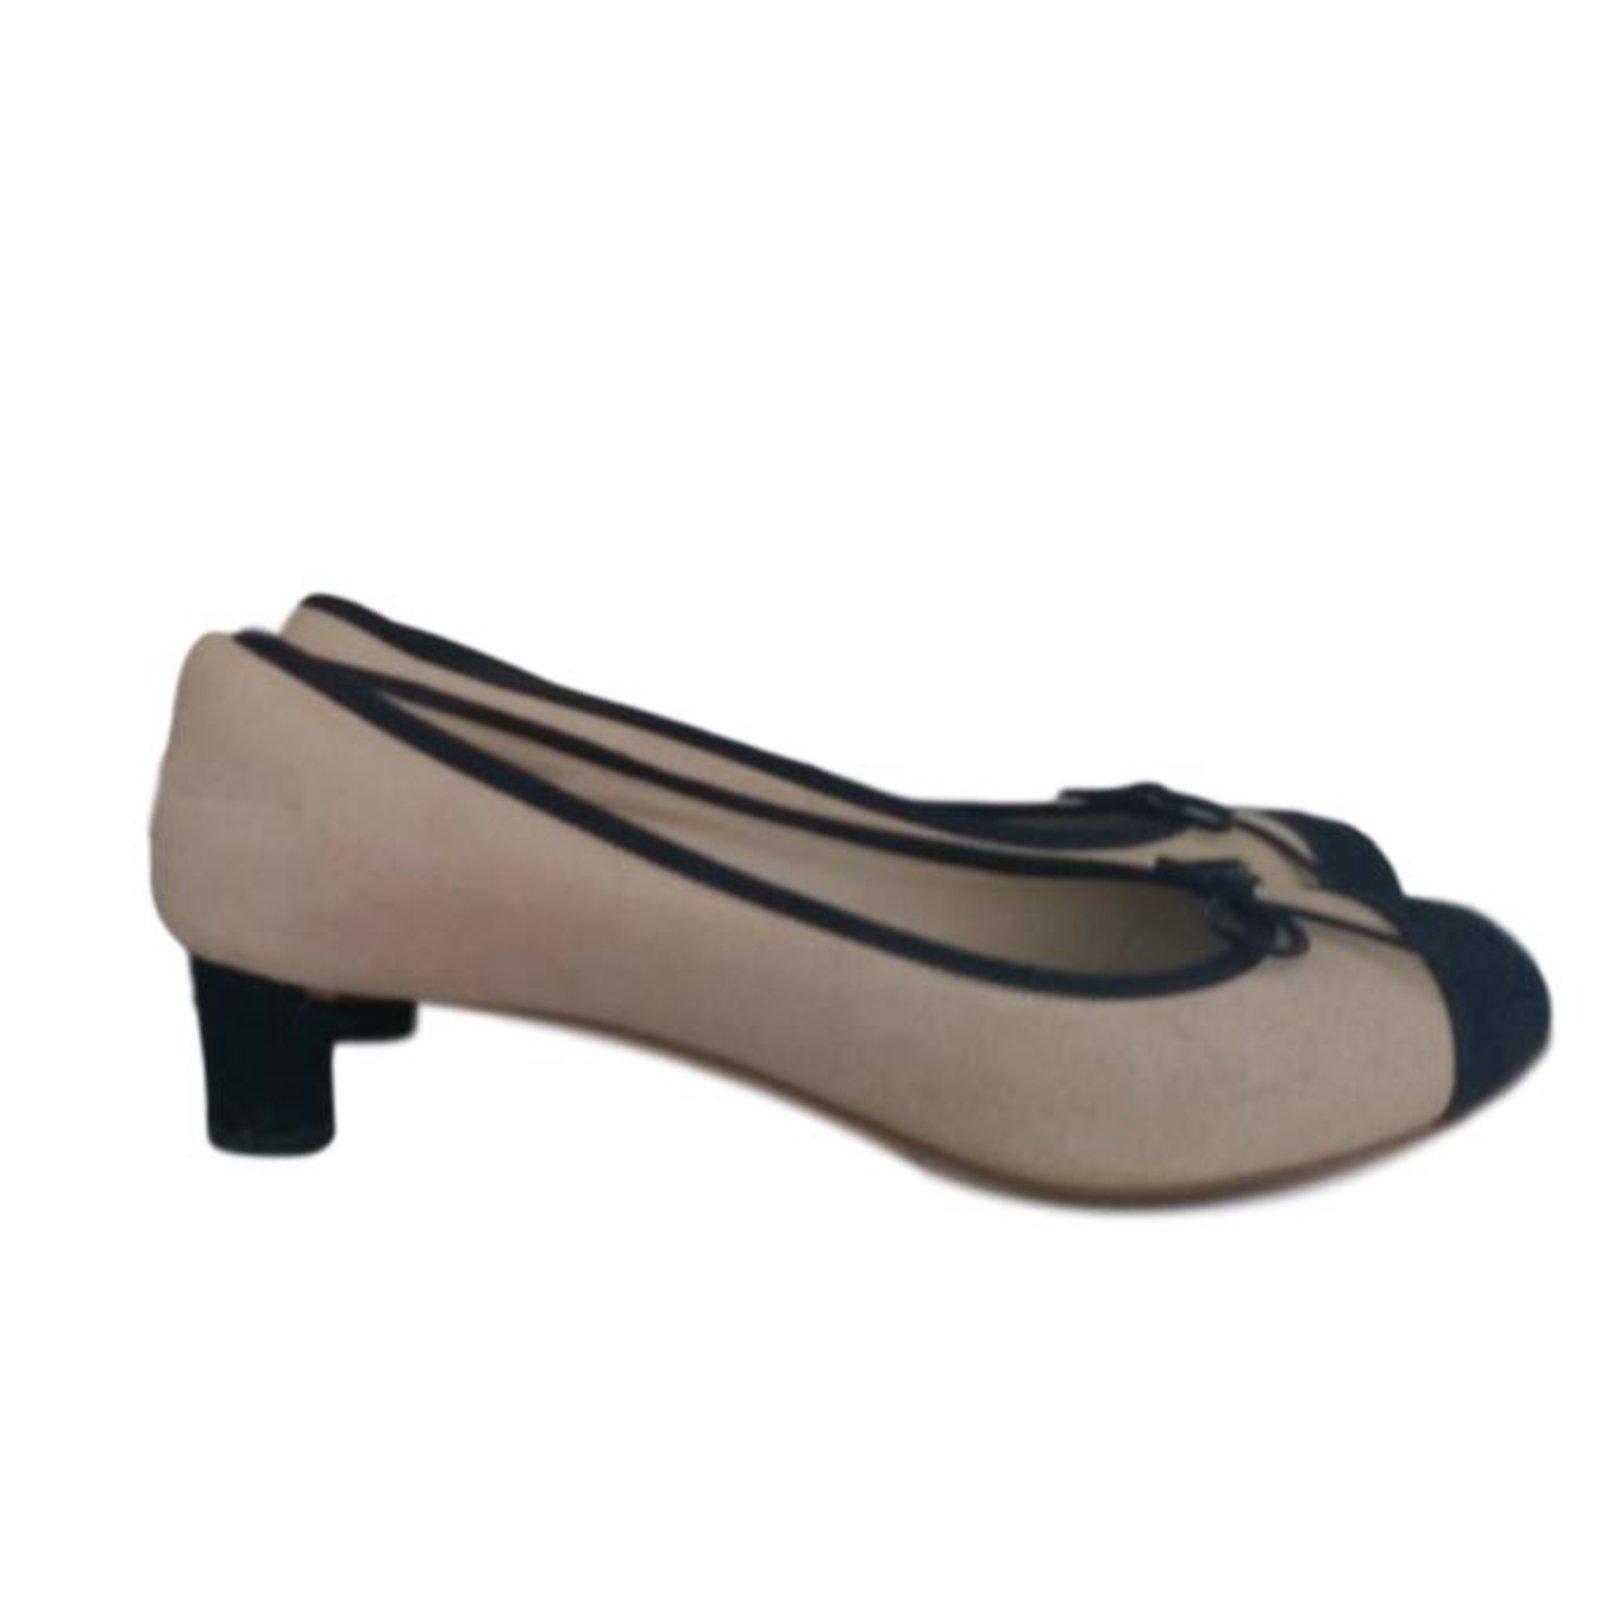 Sandales Chanel Escarpins Cuir Noir Beige Ref 78963 Joli Closet